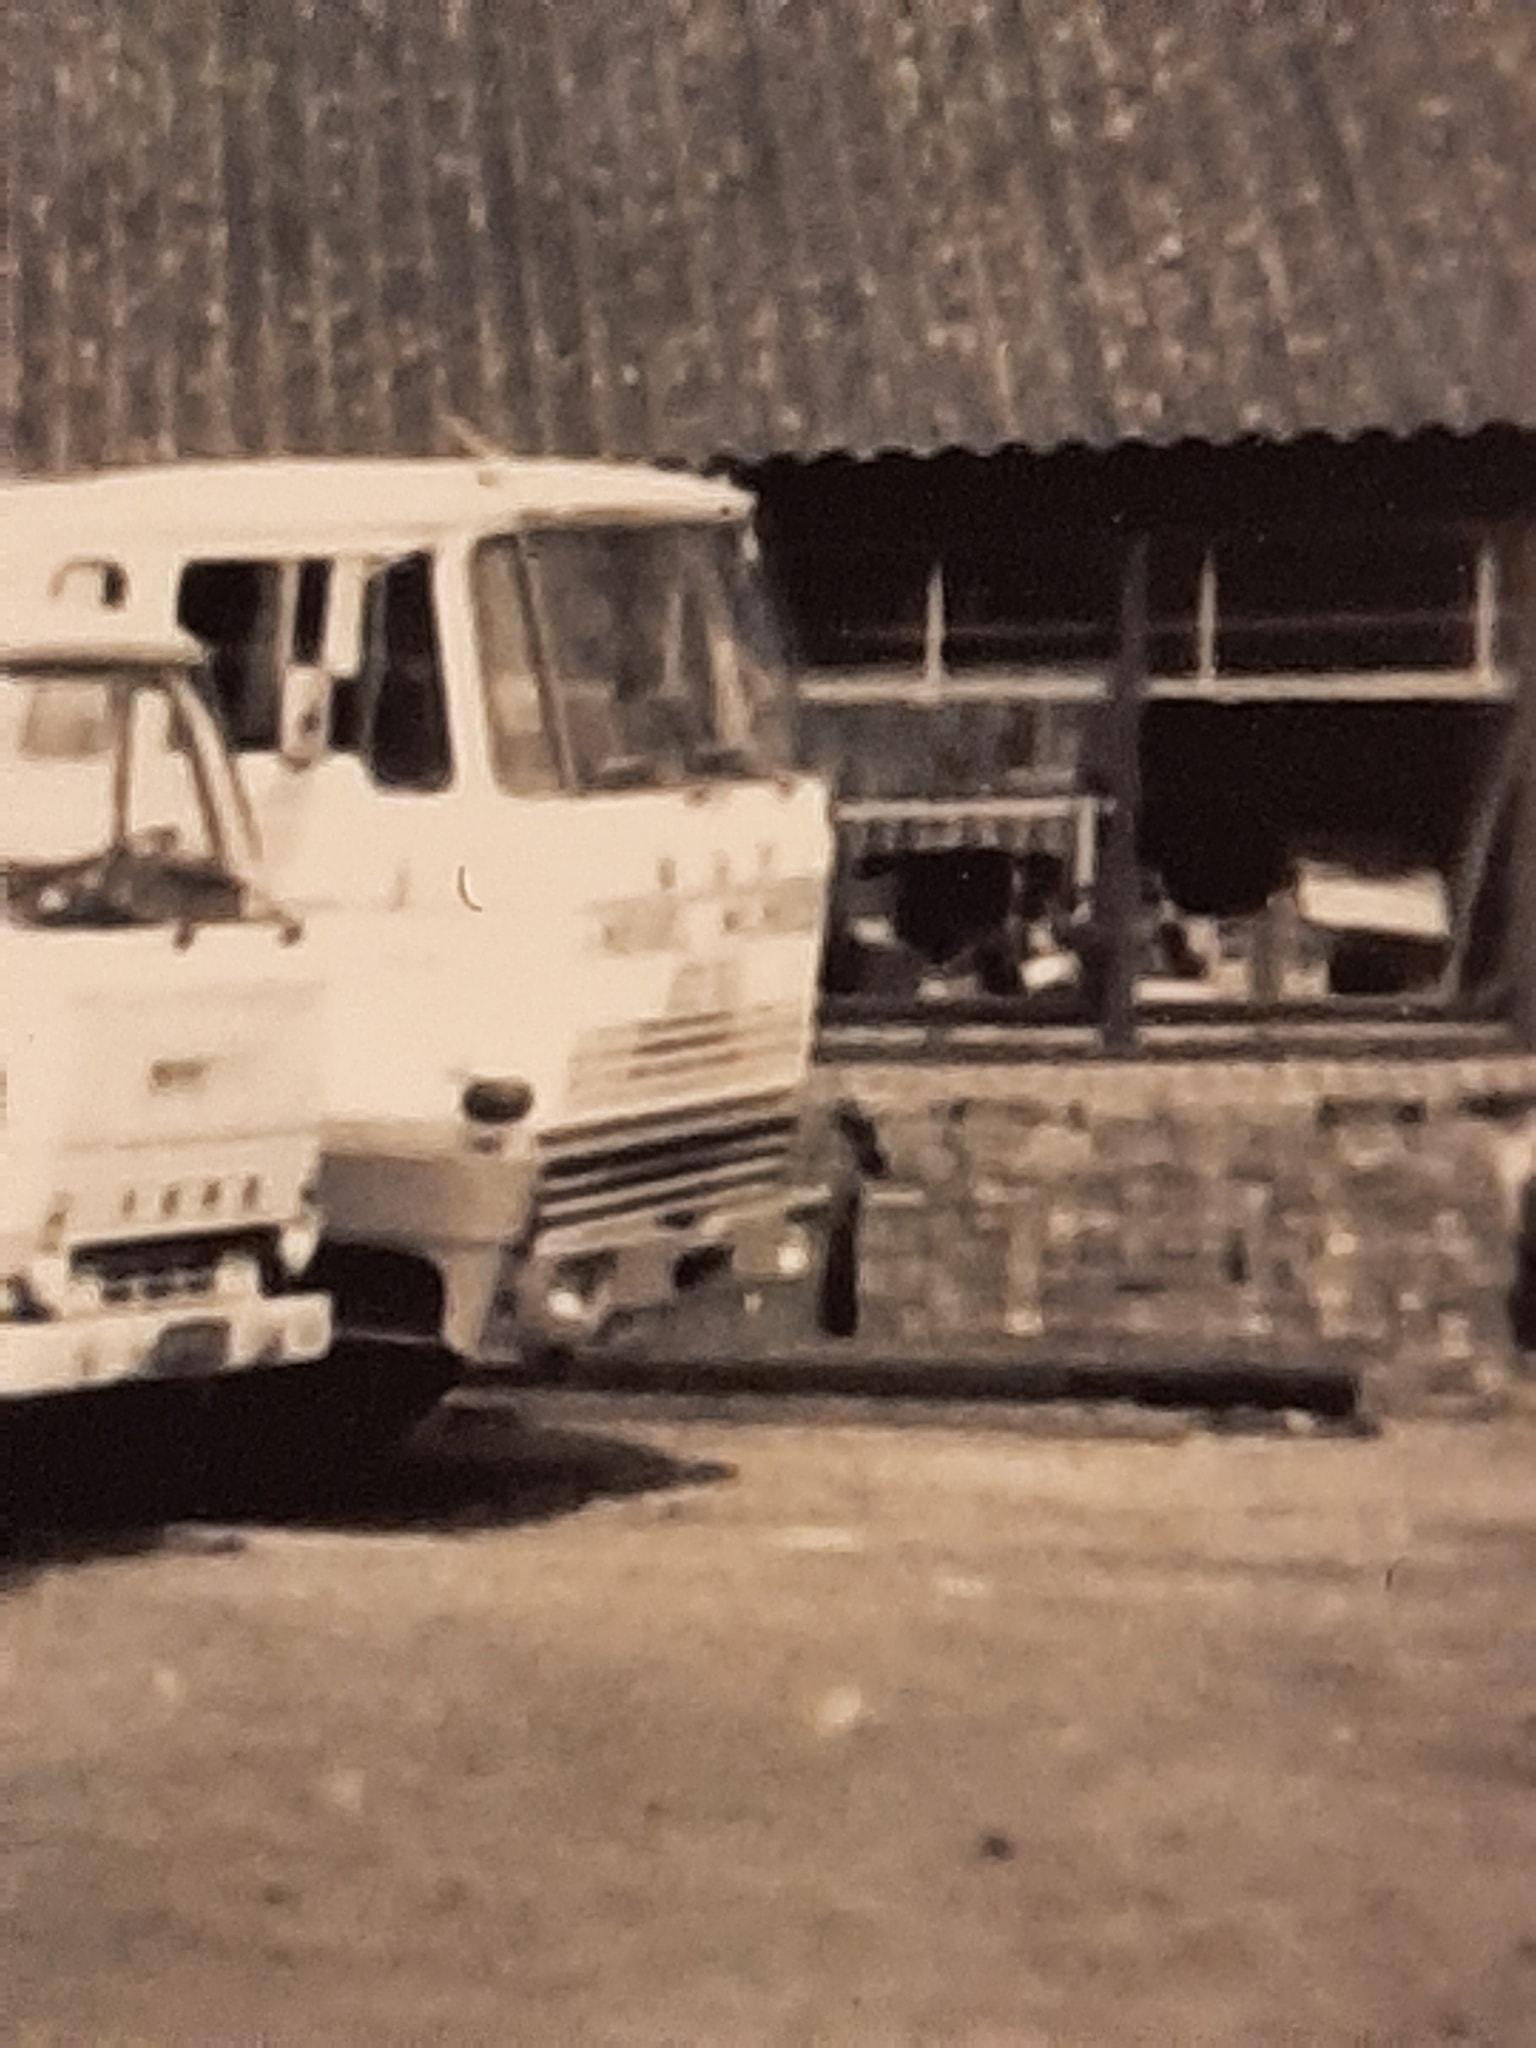 Ford-Daf--Marcel-Bouten-archief